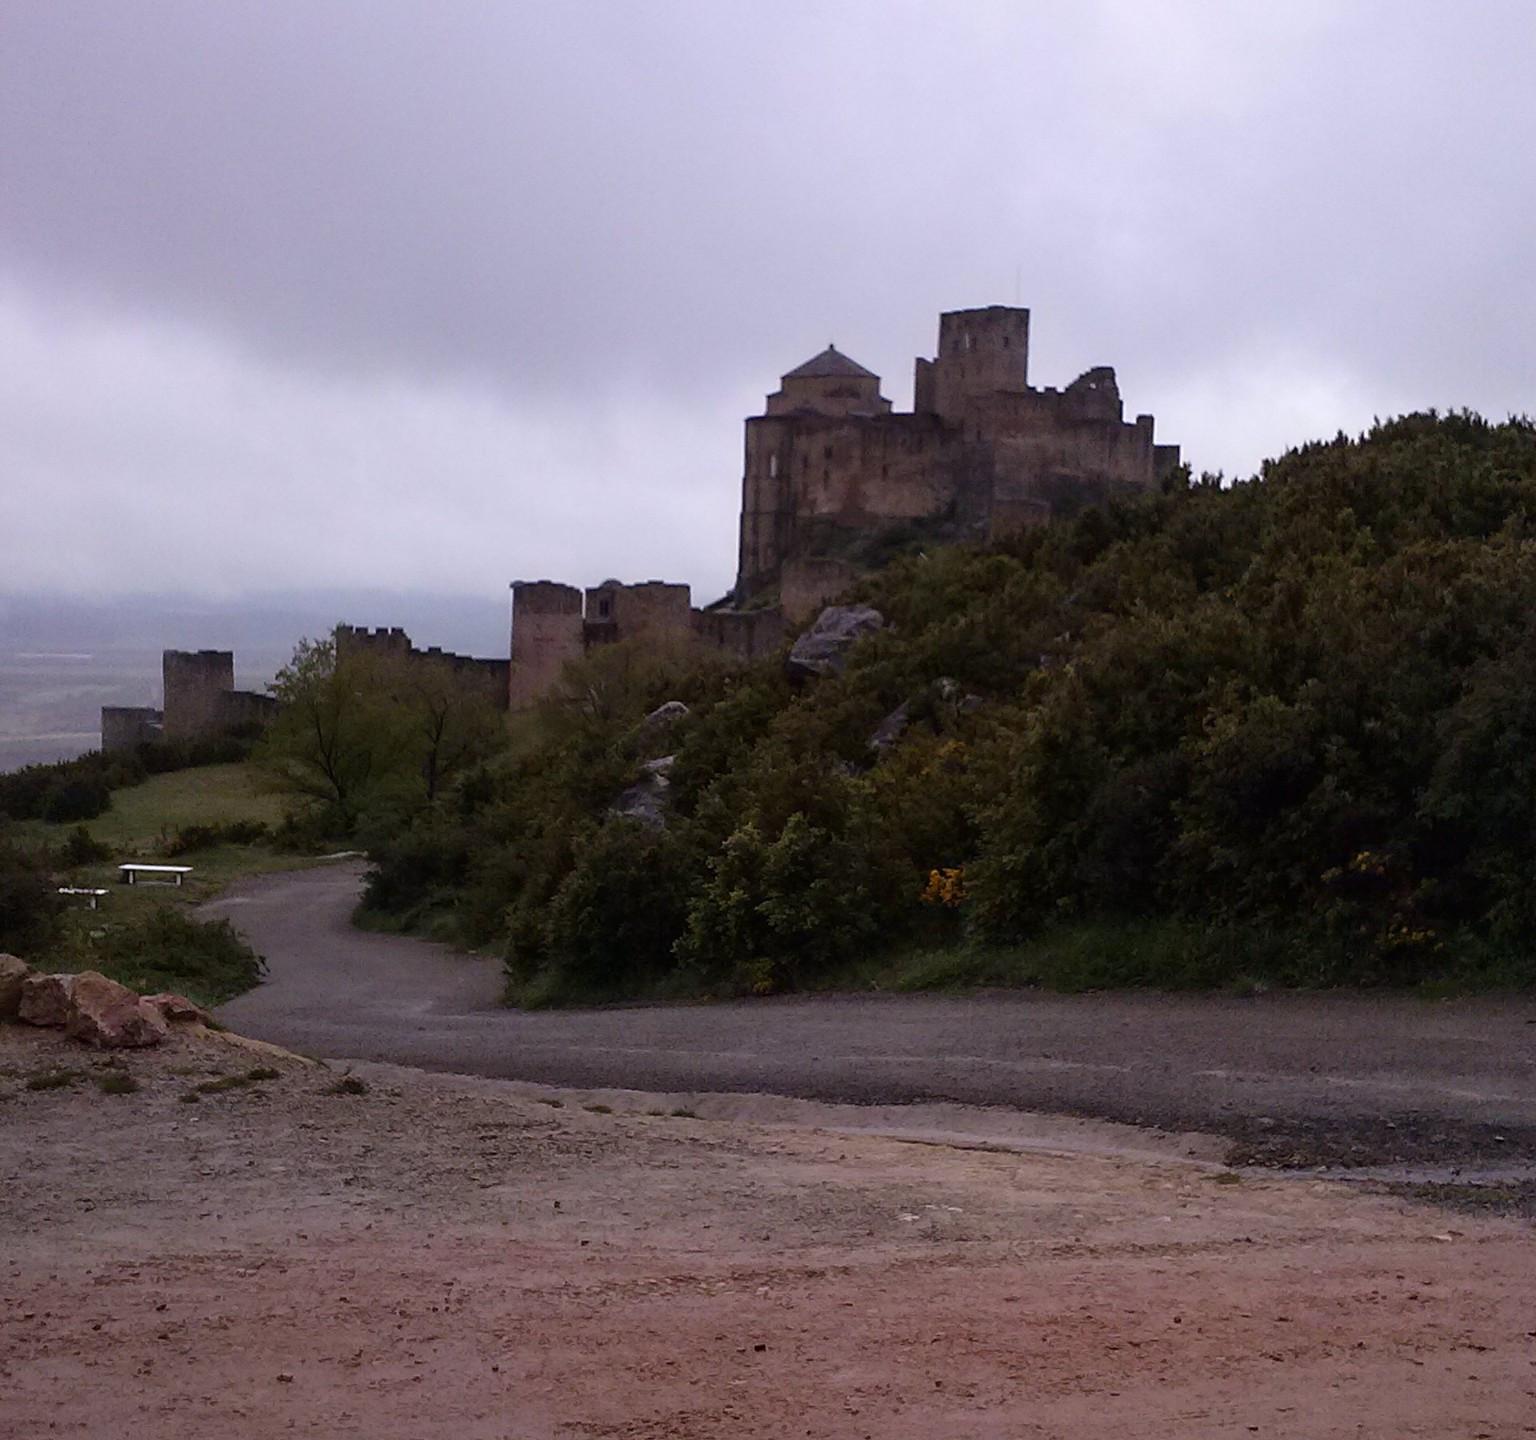 Castillo de Loarre - 07